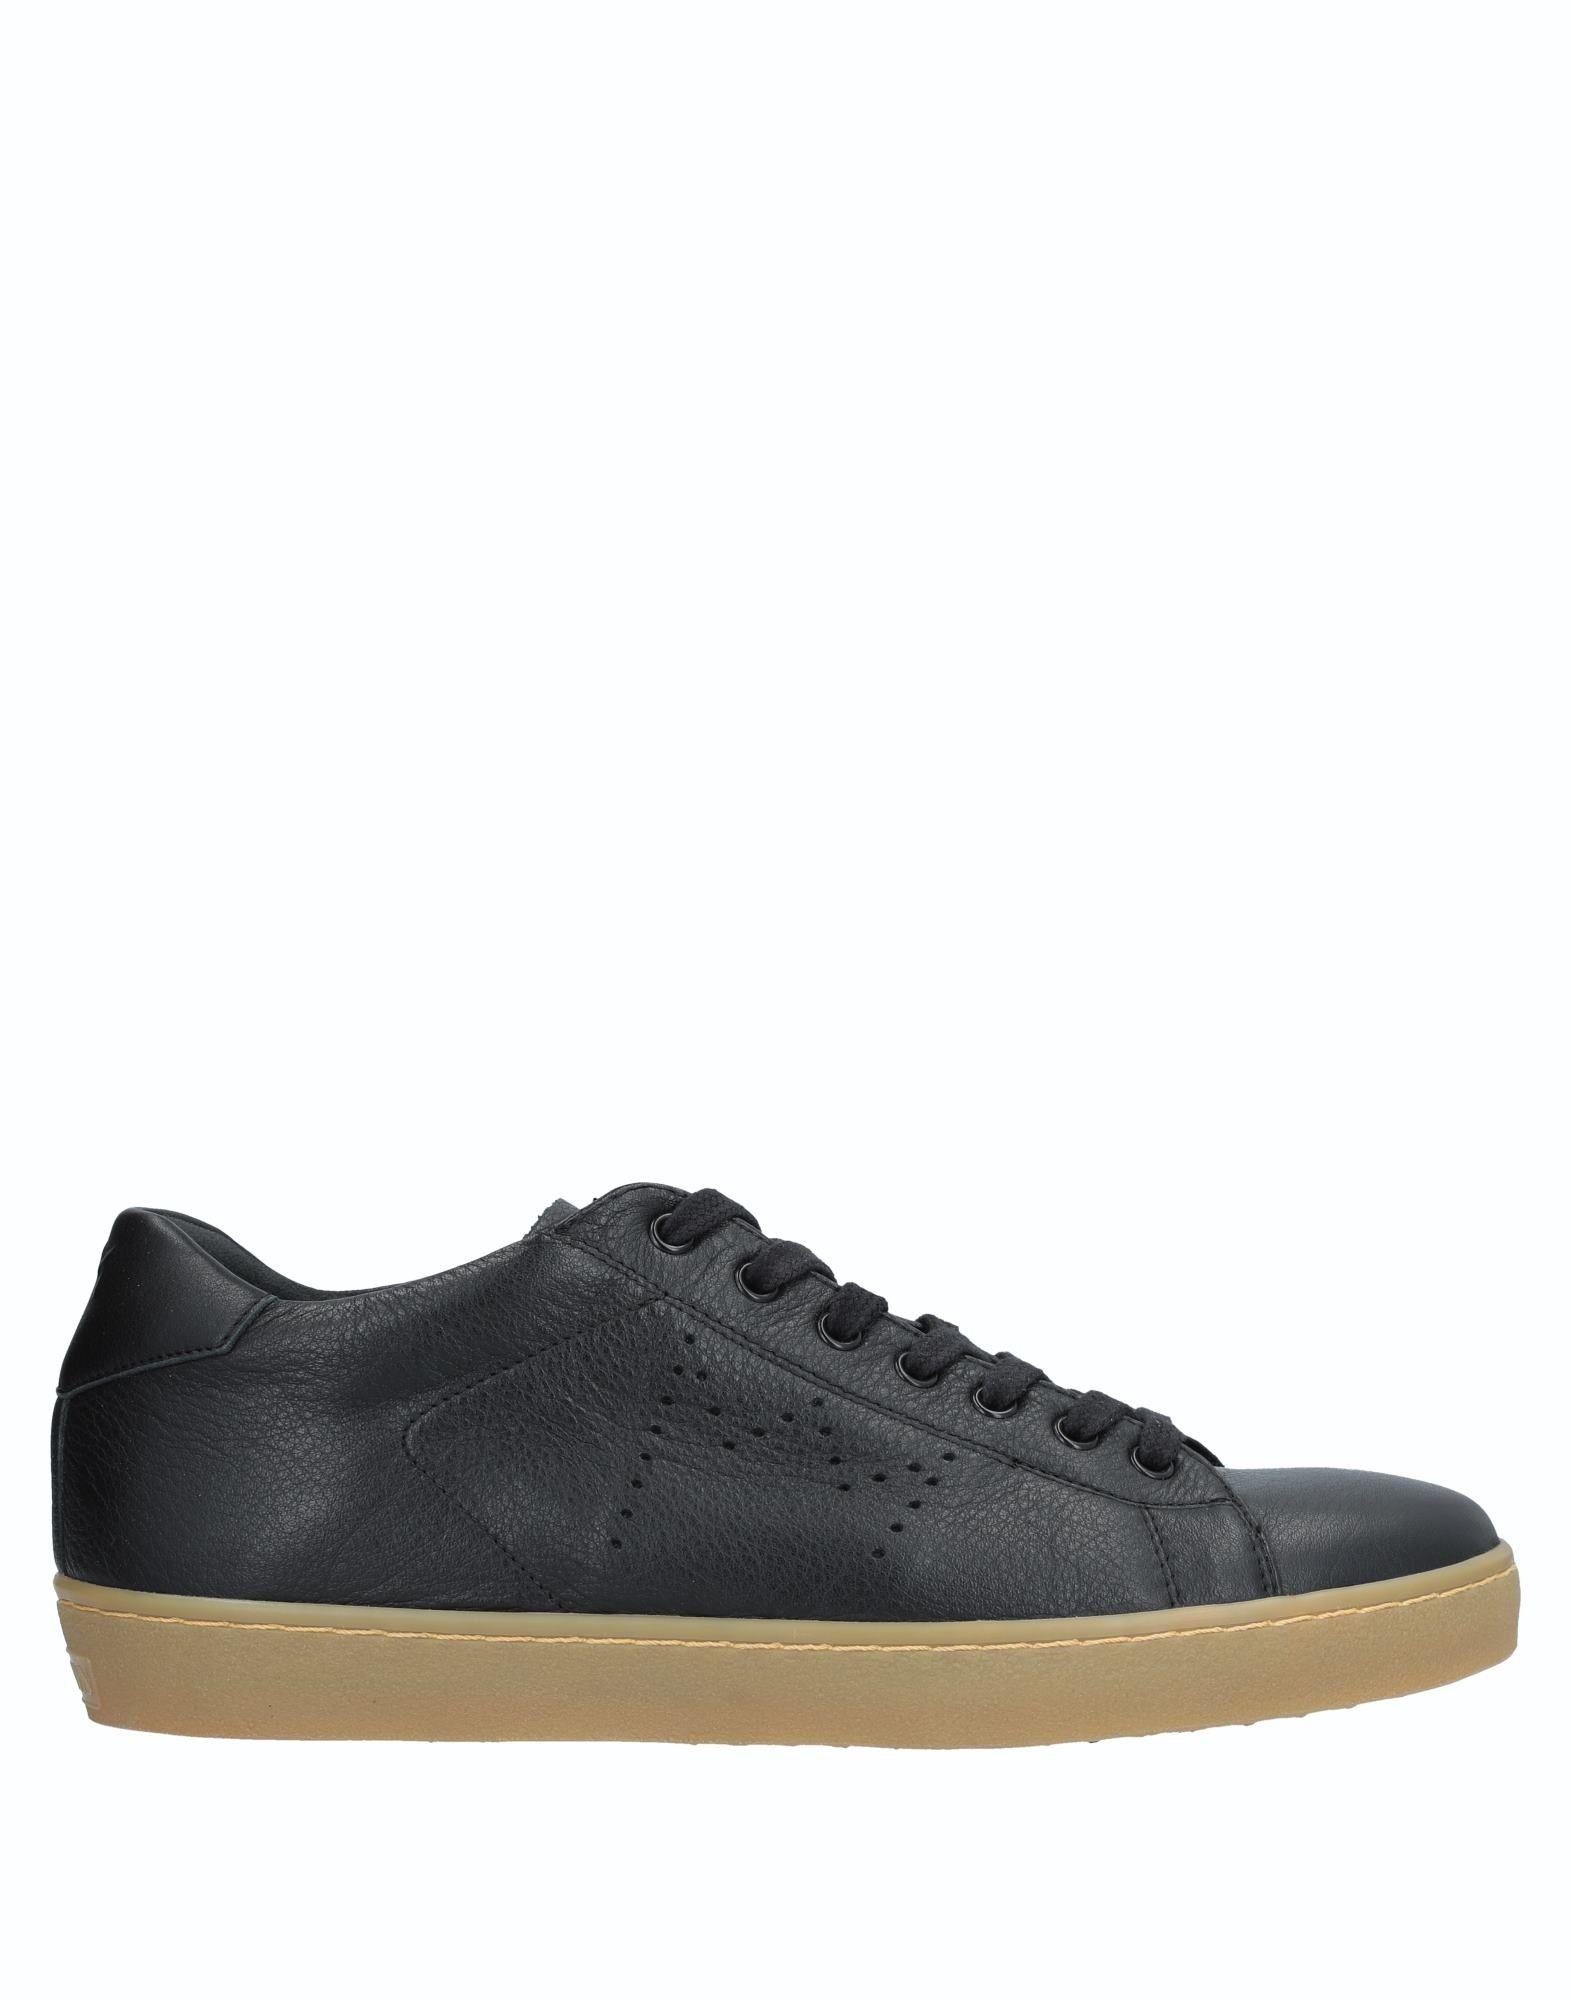 Leather Crown Sneakers Herren  11537234PV Gute Qualität beliebte Schuhe